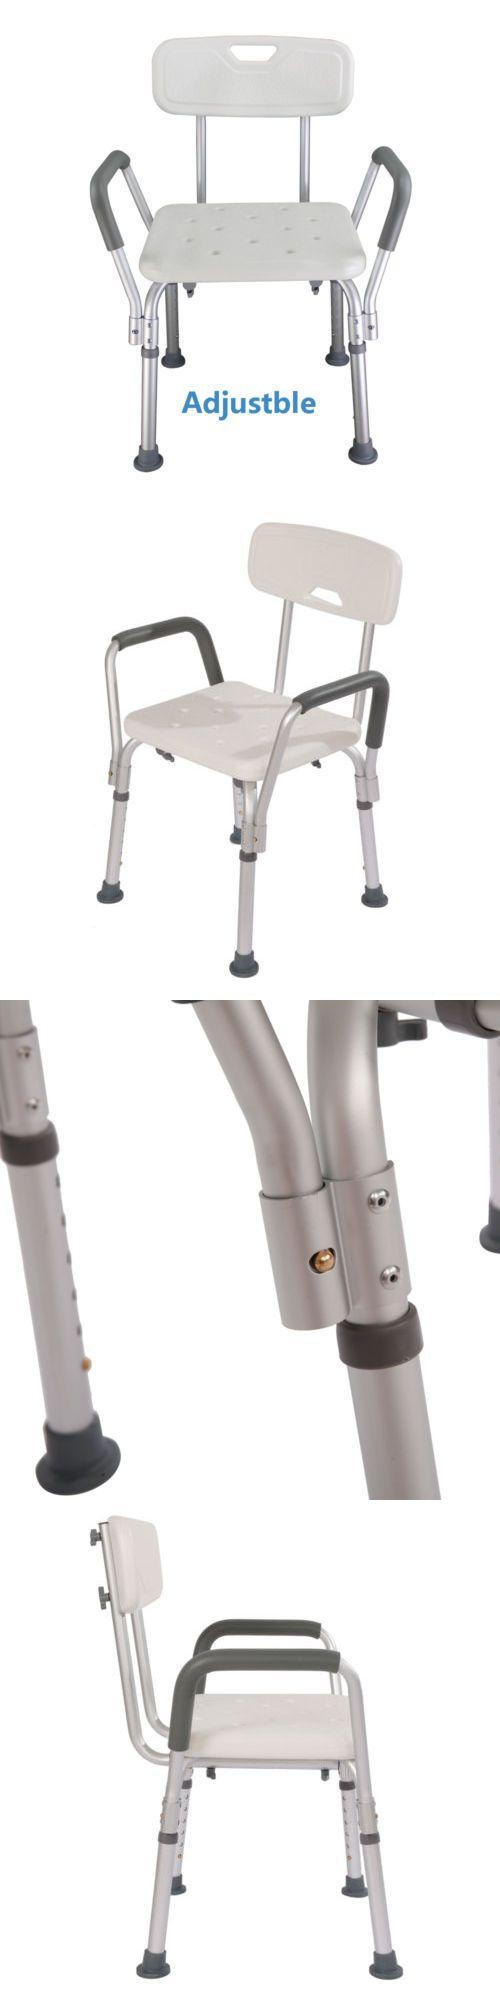 best 25 bath chair for elderly ideas on pinterest handicap shower and bath seats new adjustable medical shower chair elderly bath seat armrest back legs